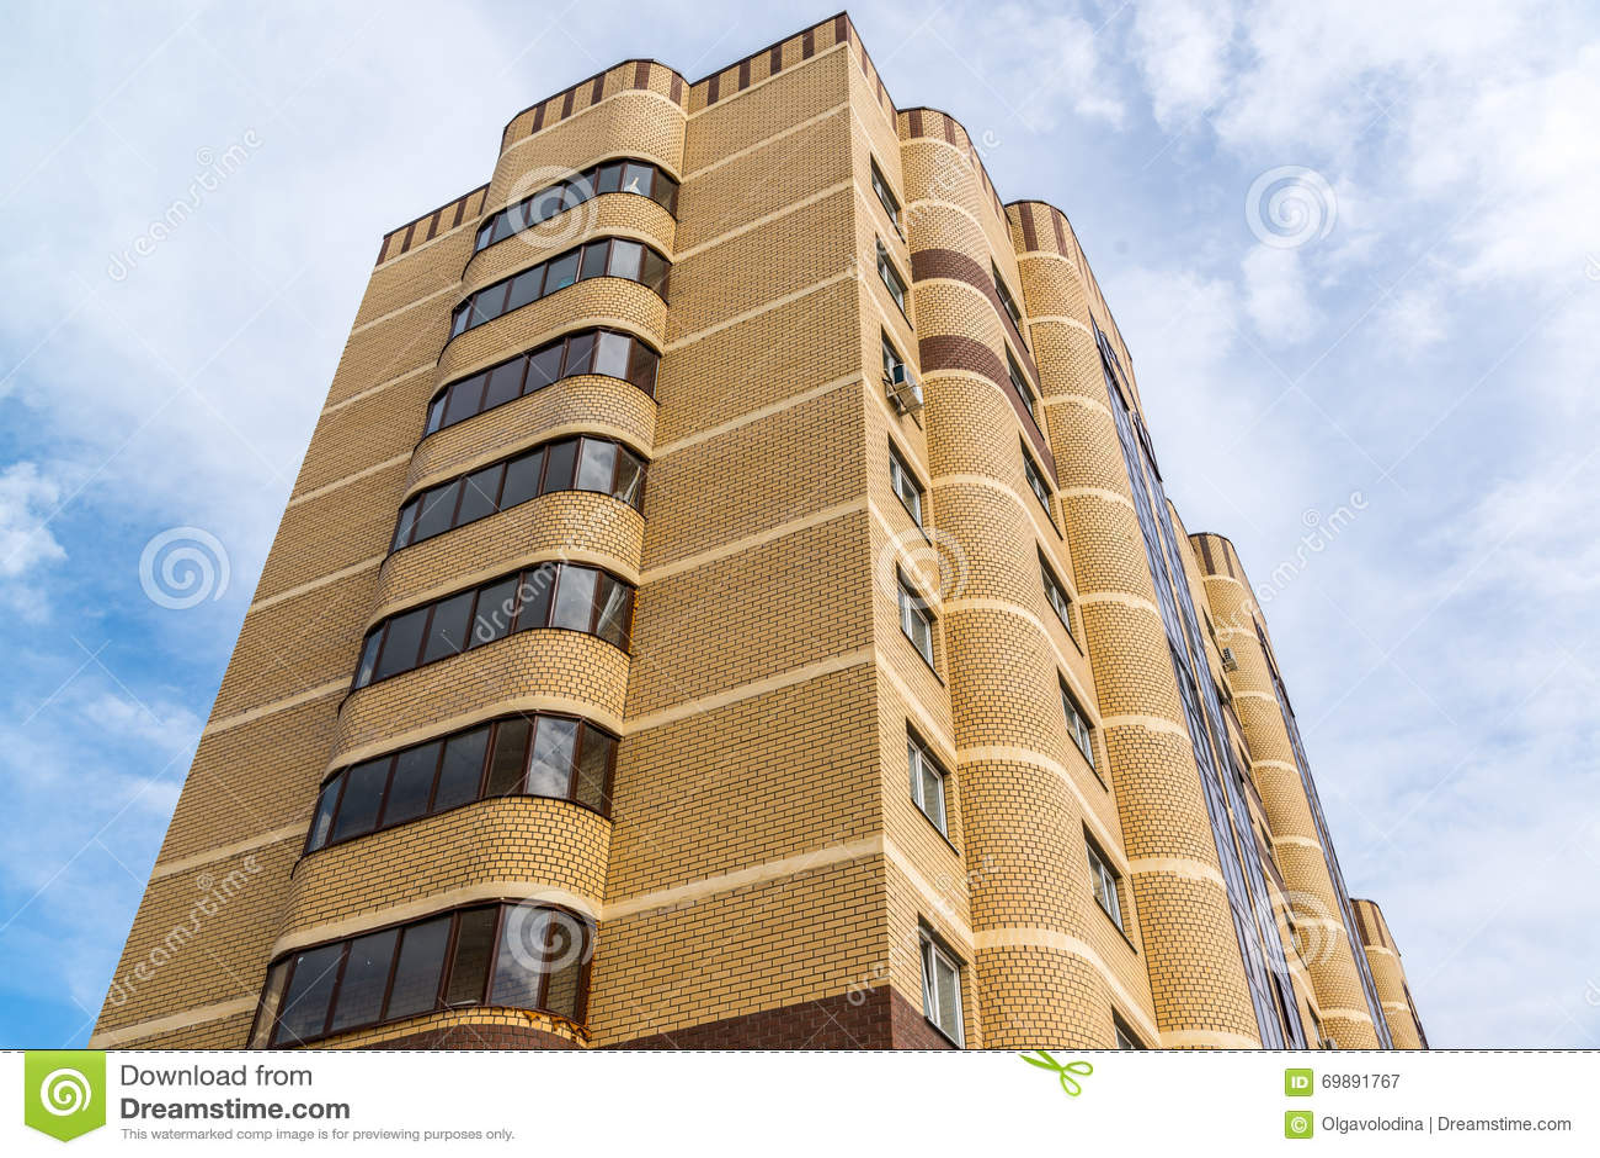 modern high rise apartment building made of brick stock image image 69891767. Black Bedroom Furniture Sets. Home Design Ideas